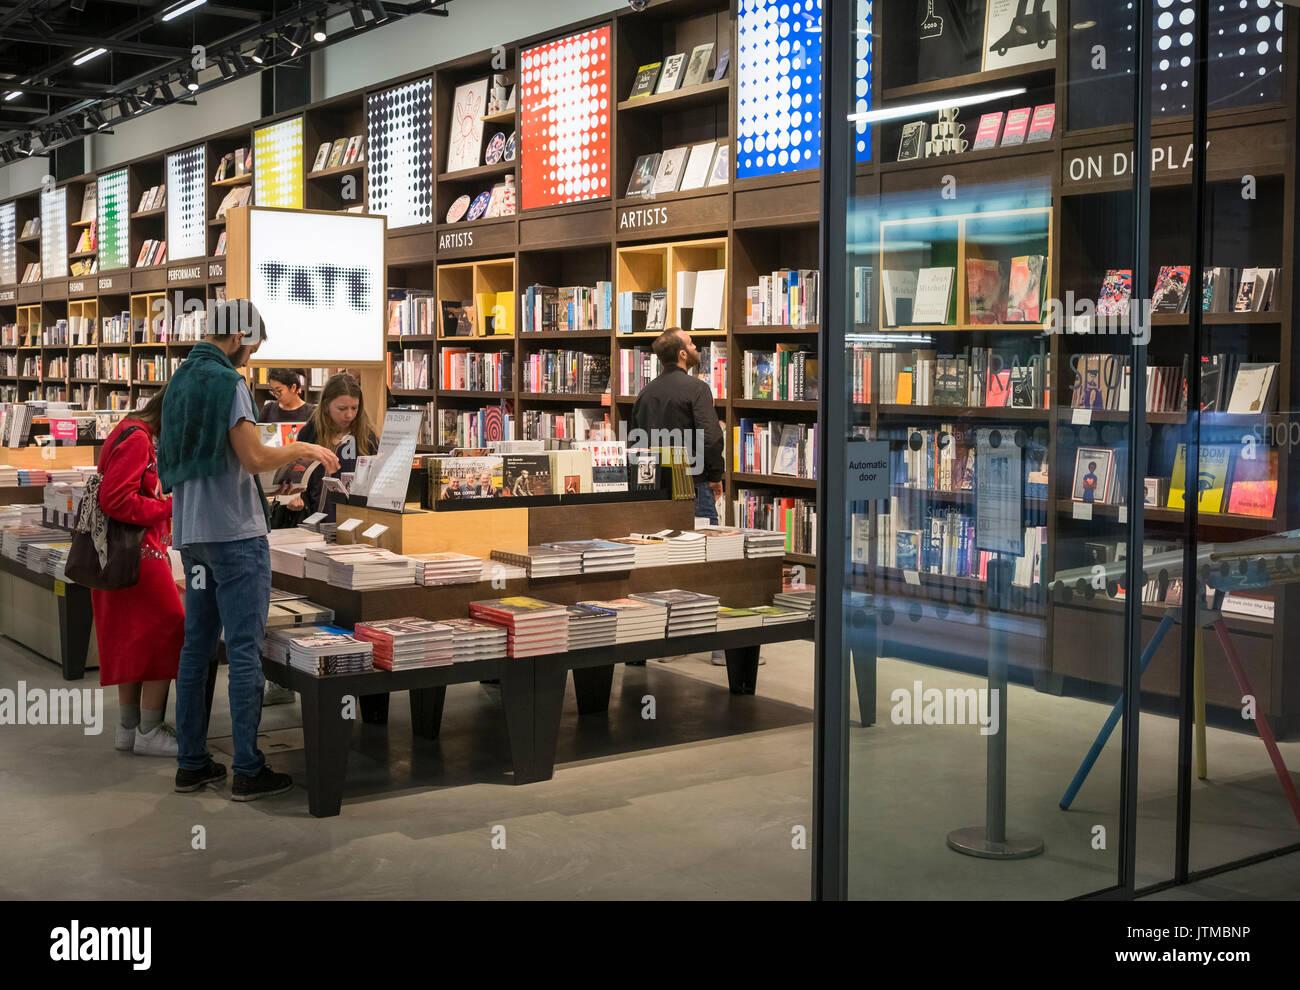 People browsing arts bookstore, London, England UK - Stock Image